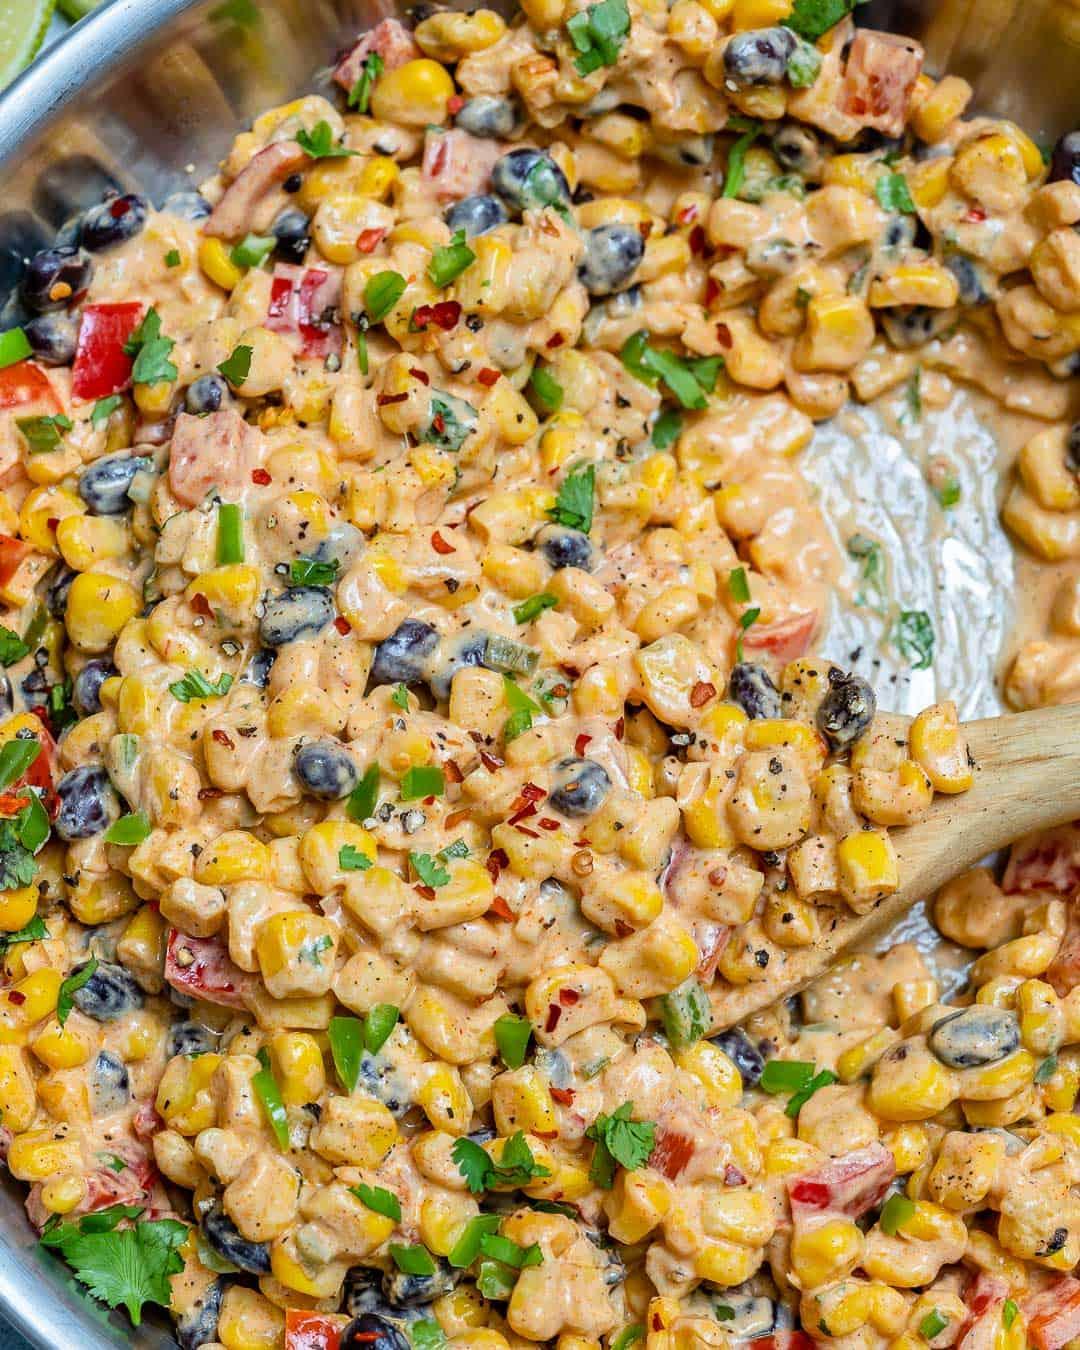 creamy corn salad recipe thats a perfect side dish